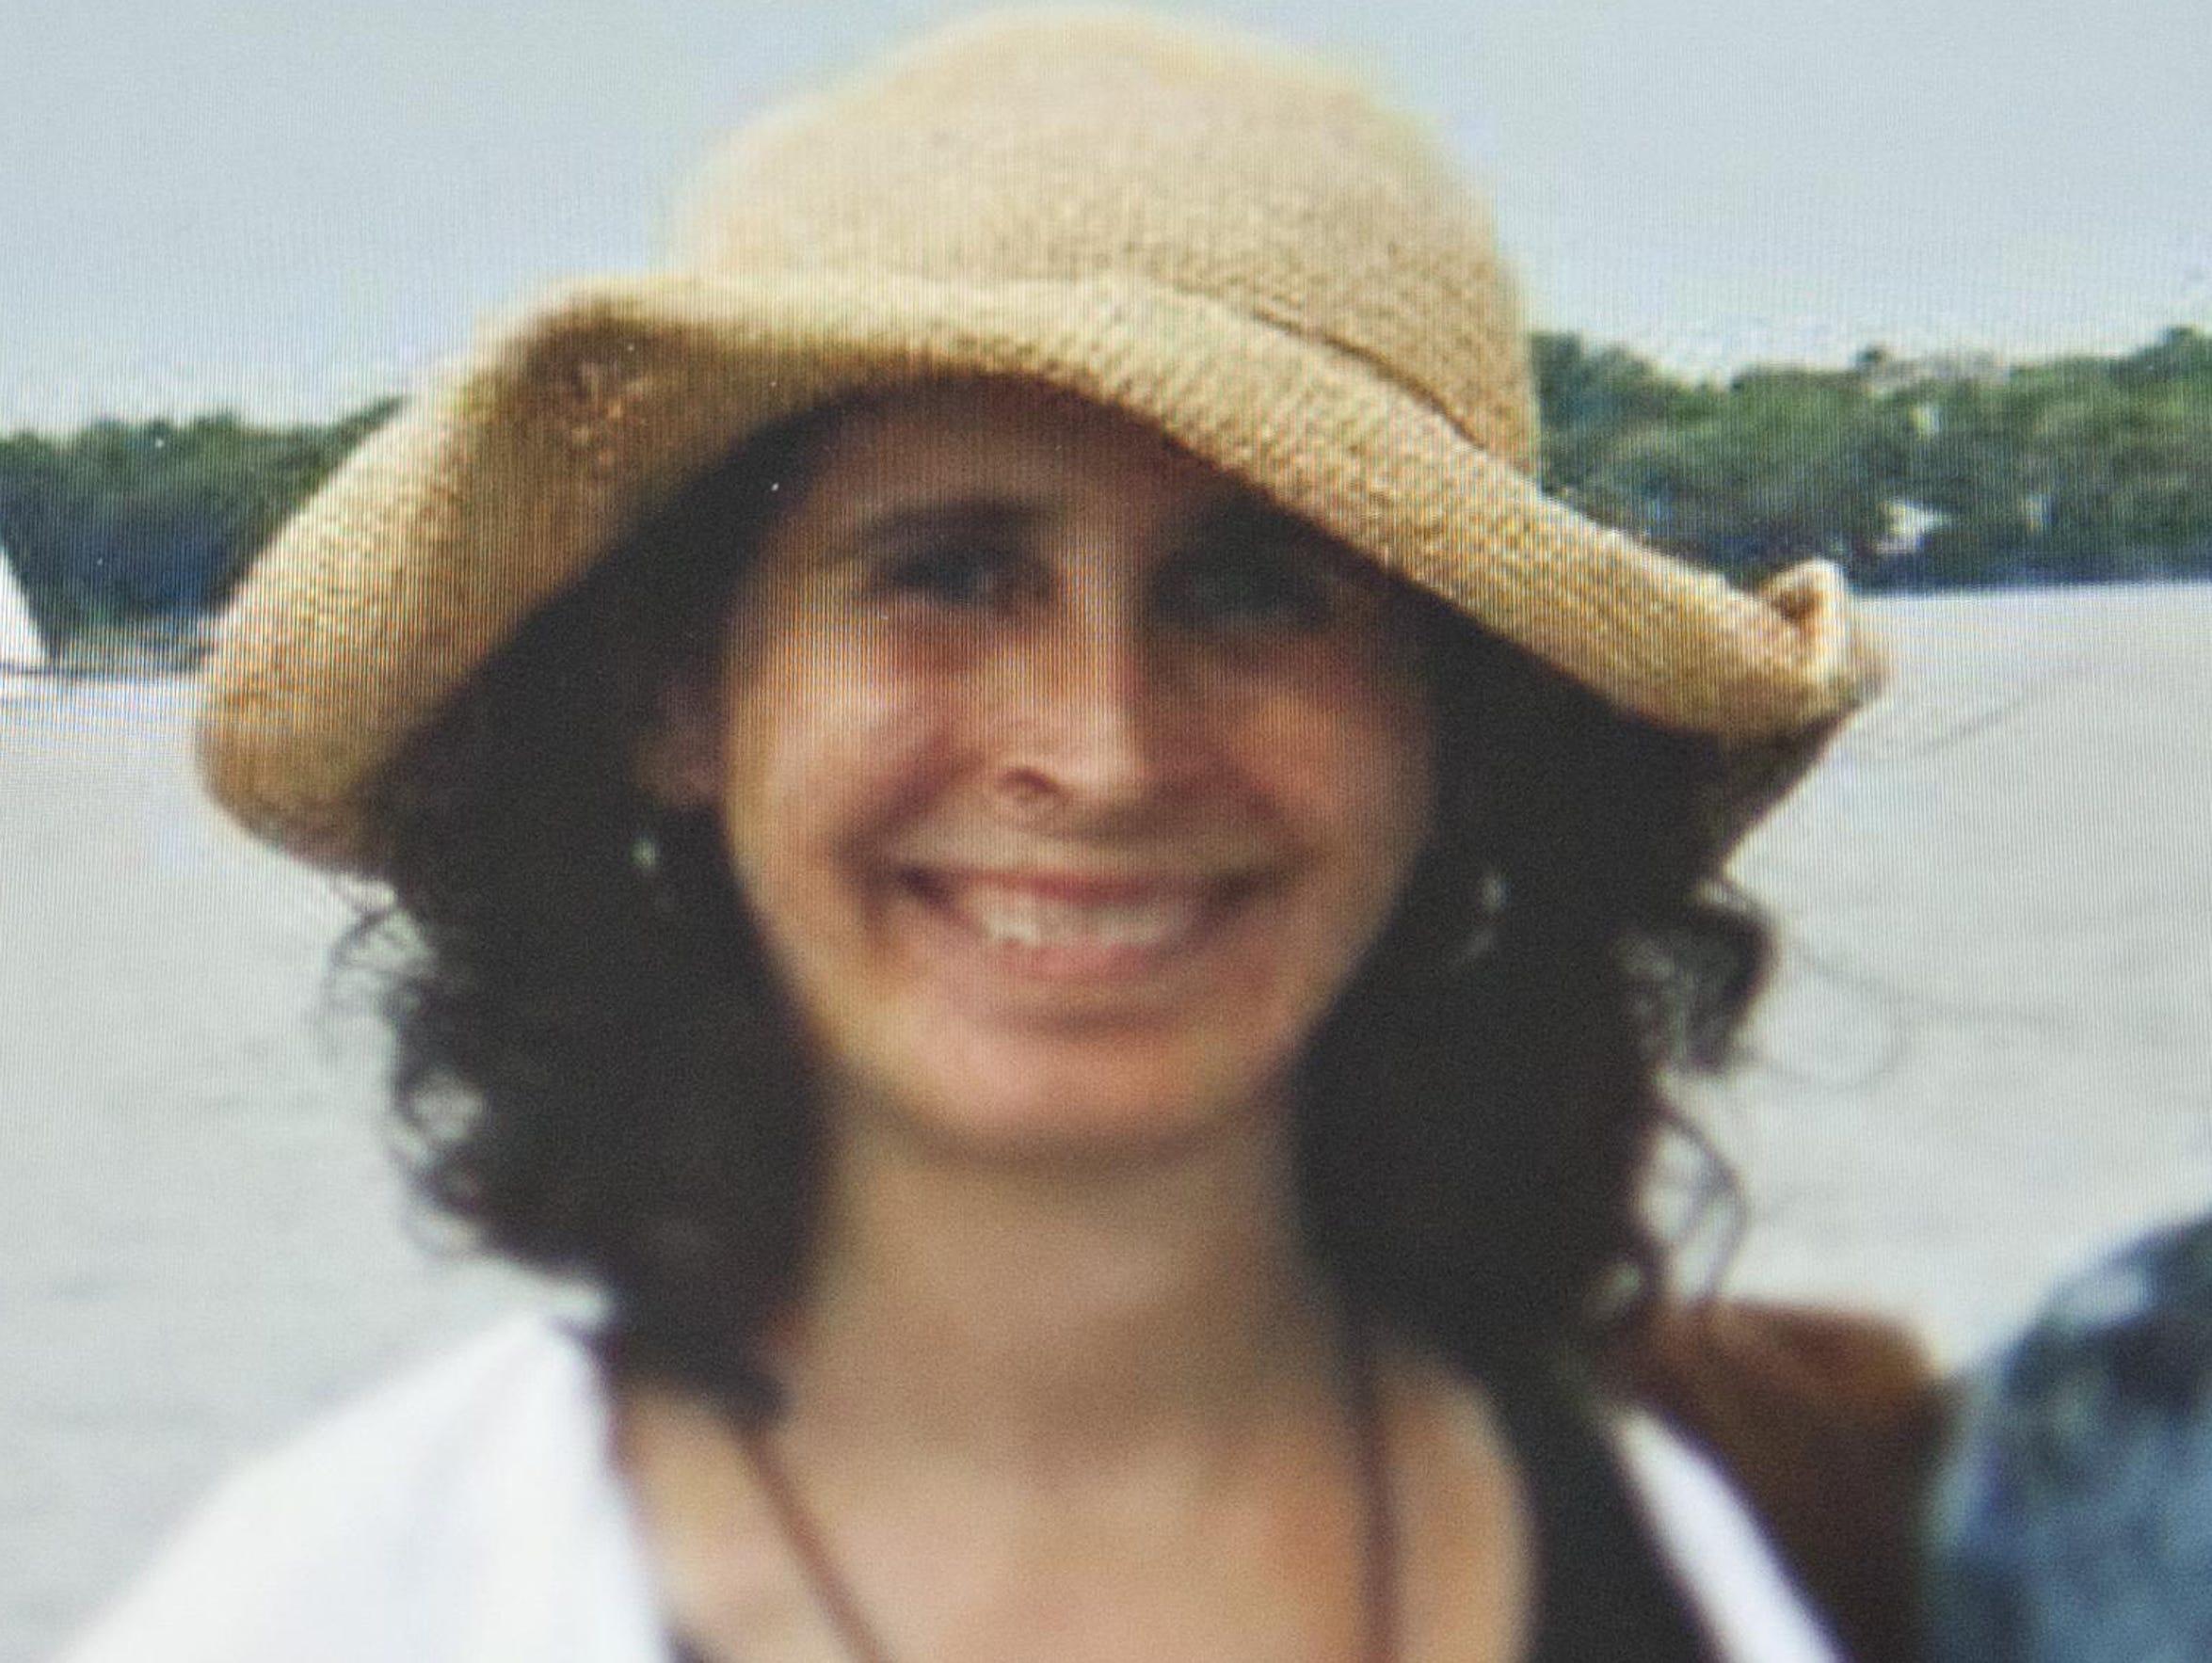 Lara Sobel, 48, of East Montpelier is seen in this